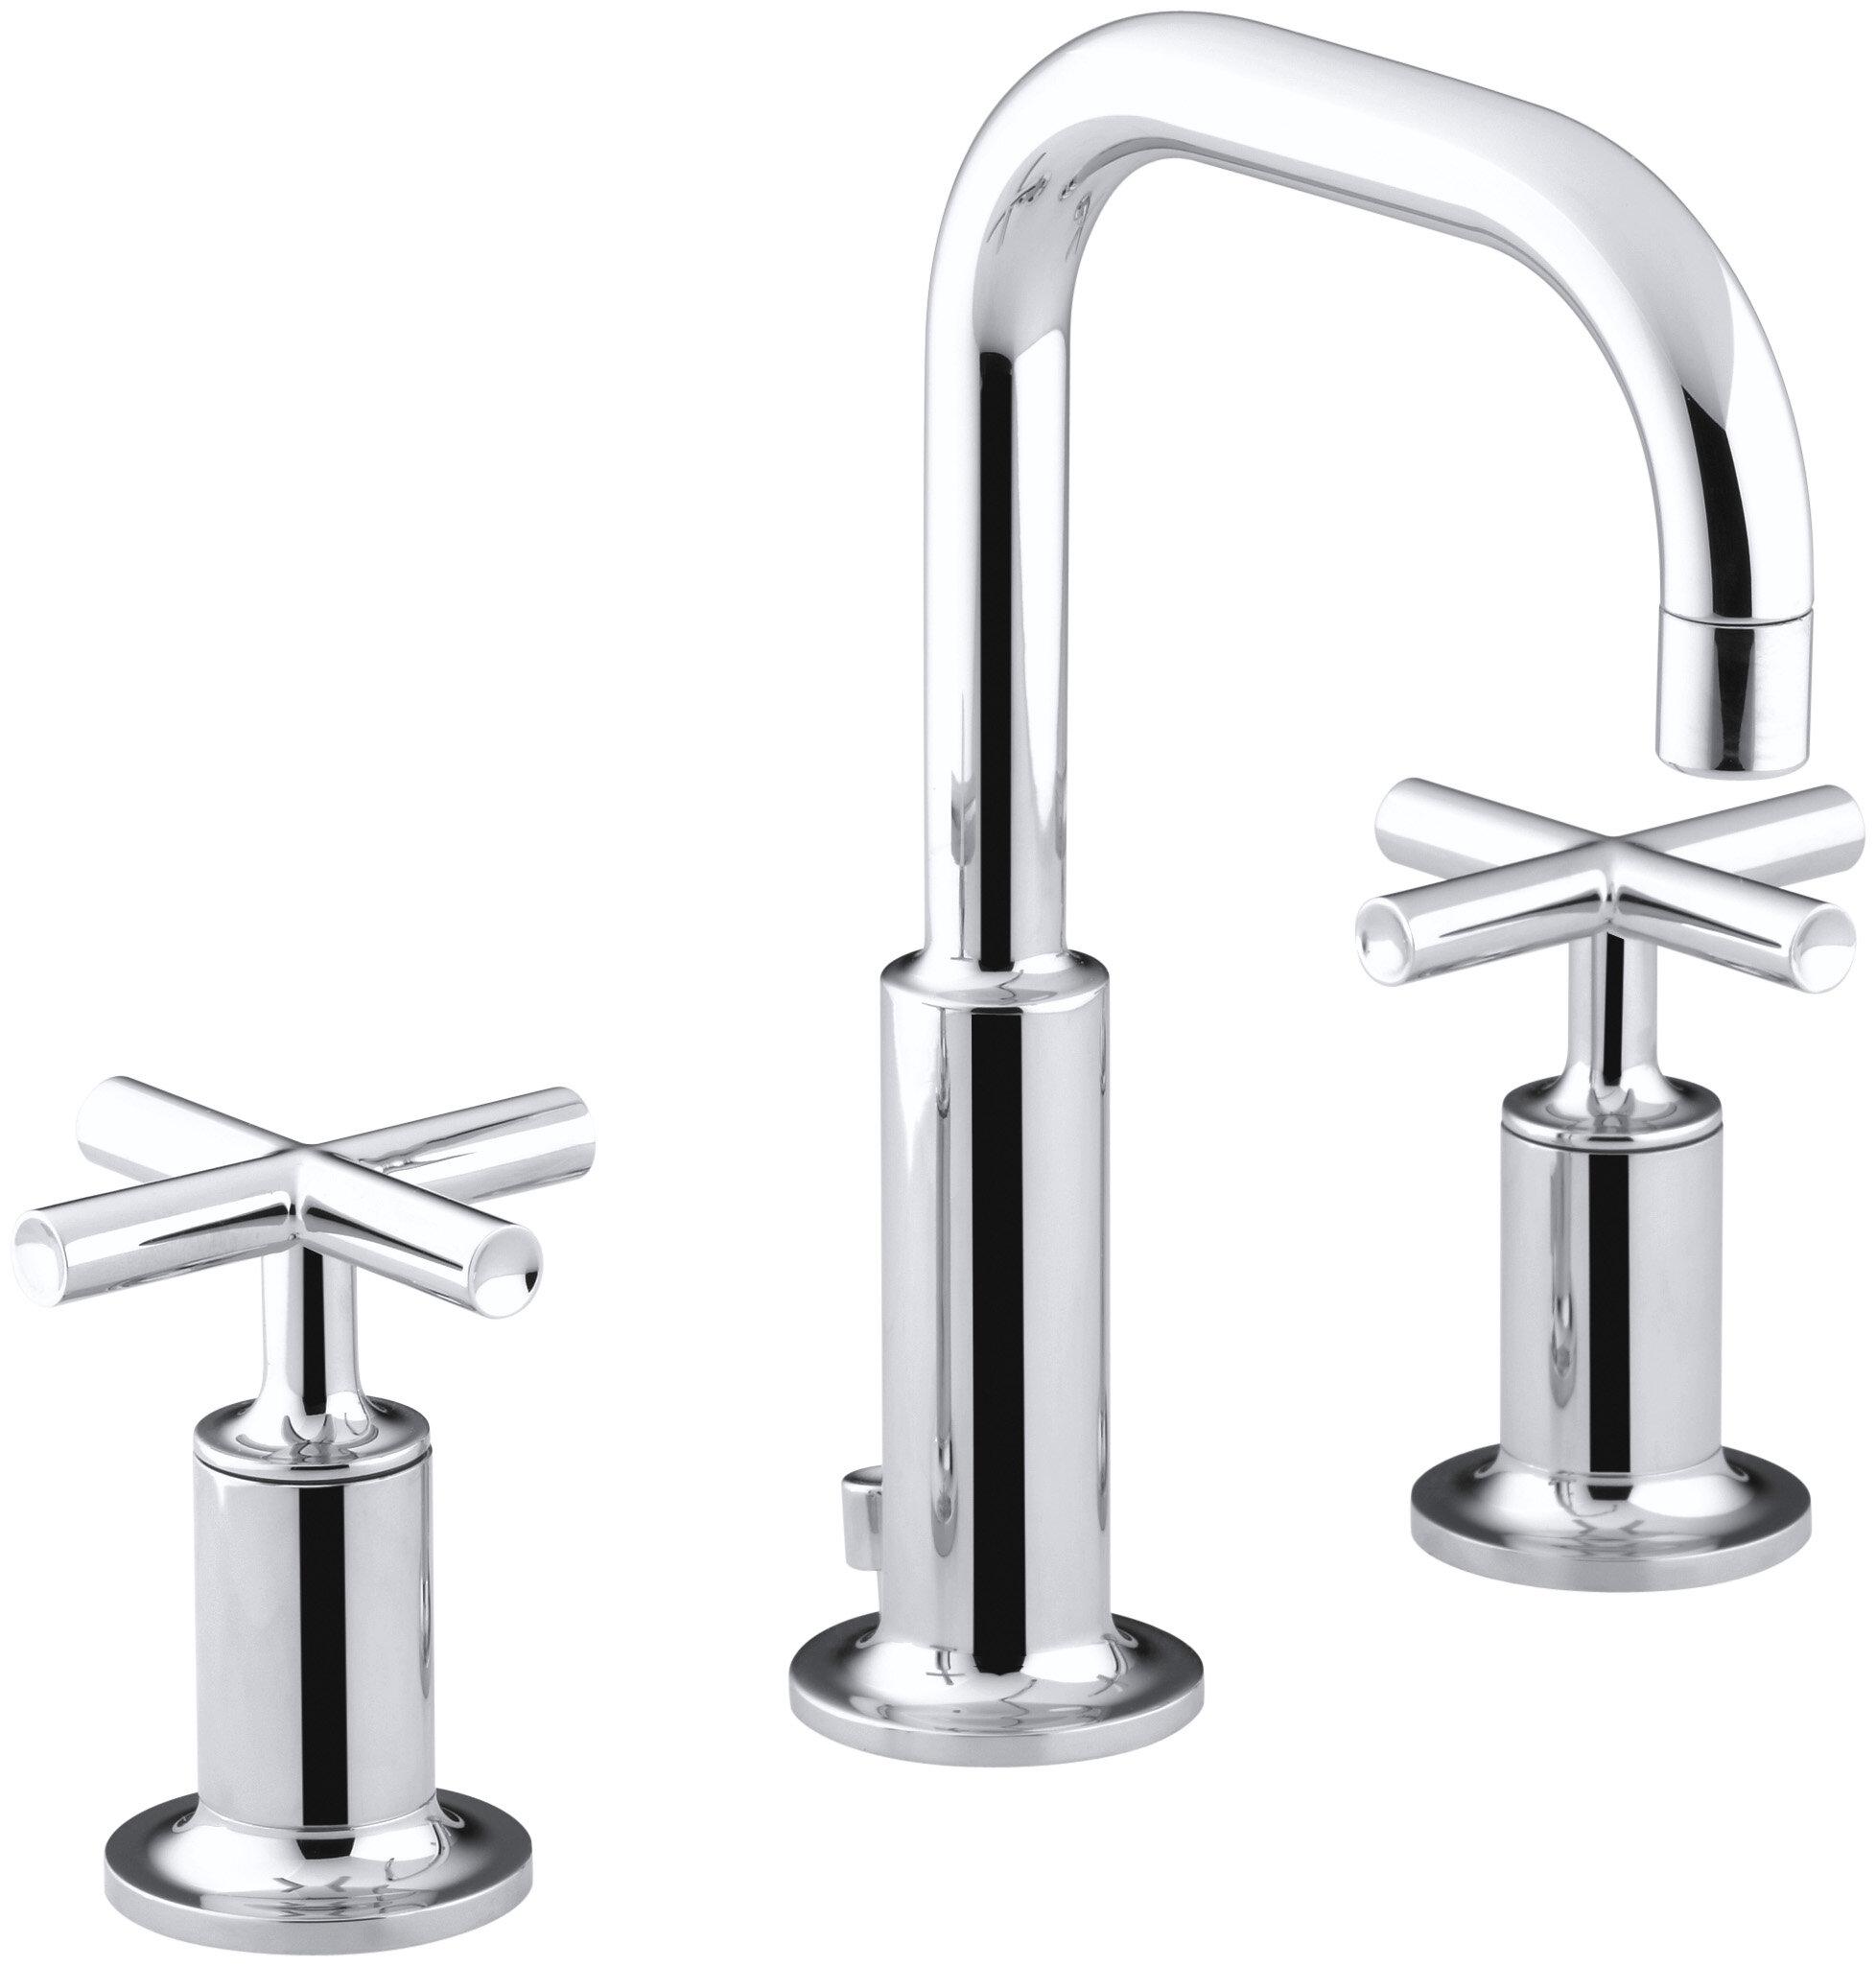 Kohler Purist Widespread Bathroom Sink Faucet with Low Cross ...